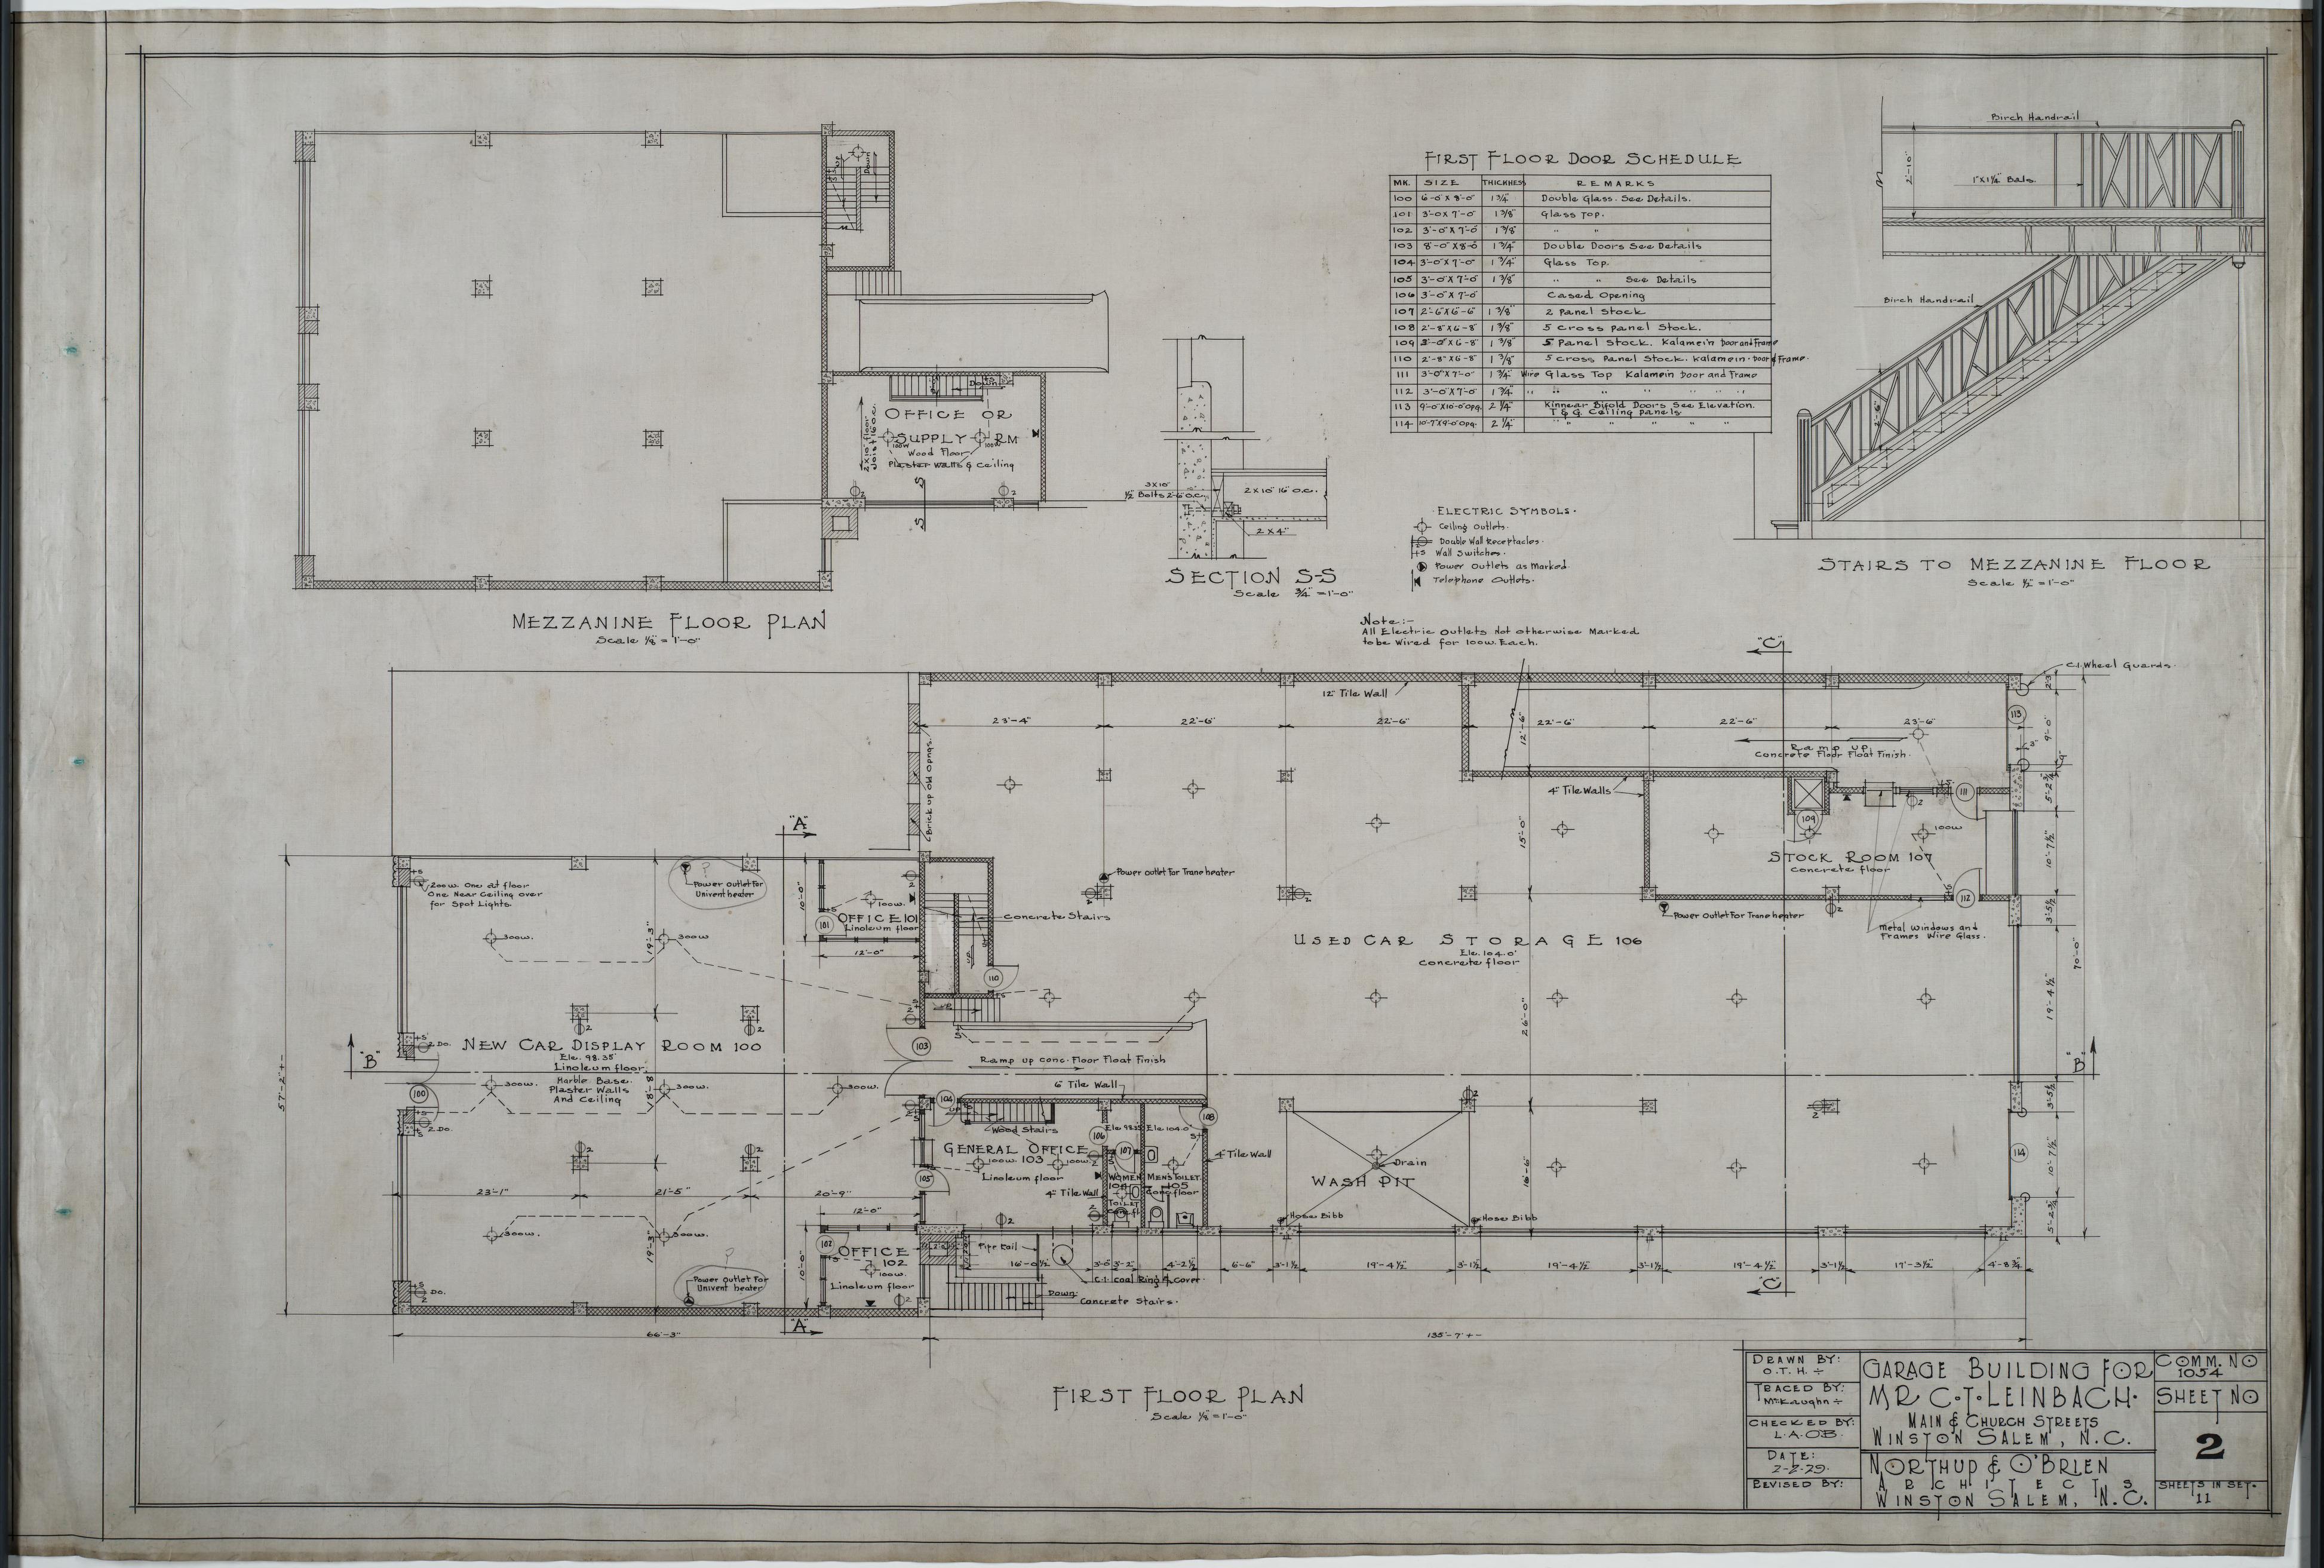 First Floor Plan Mezzanine Floor Plan Leinbach Clarence